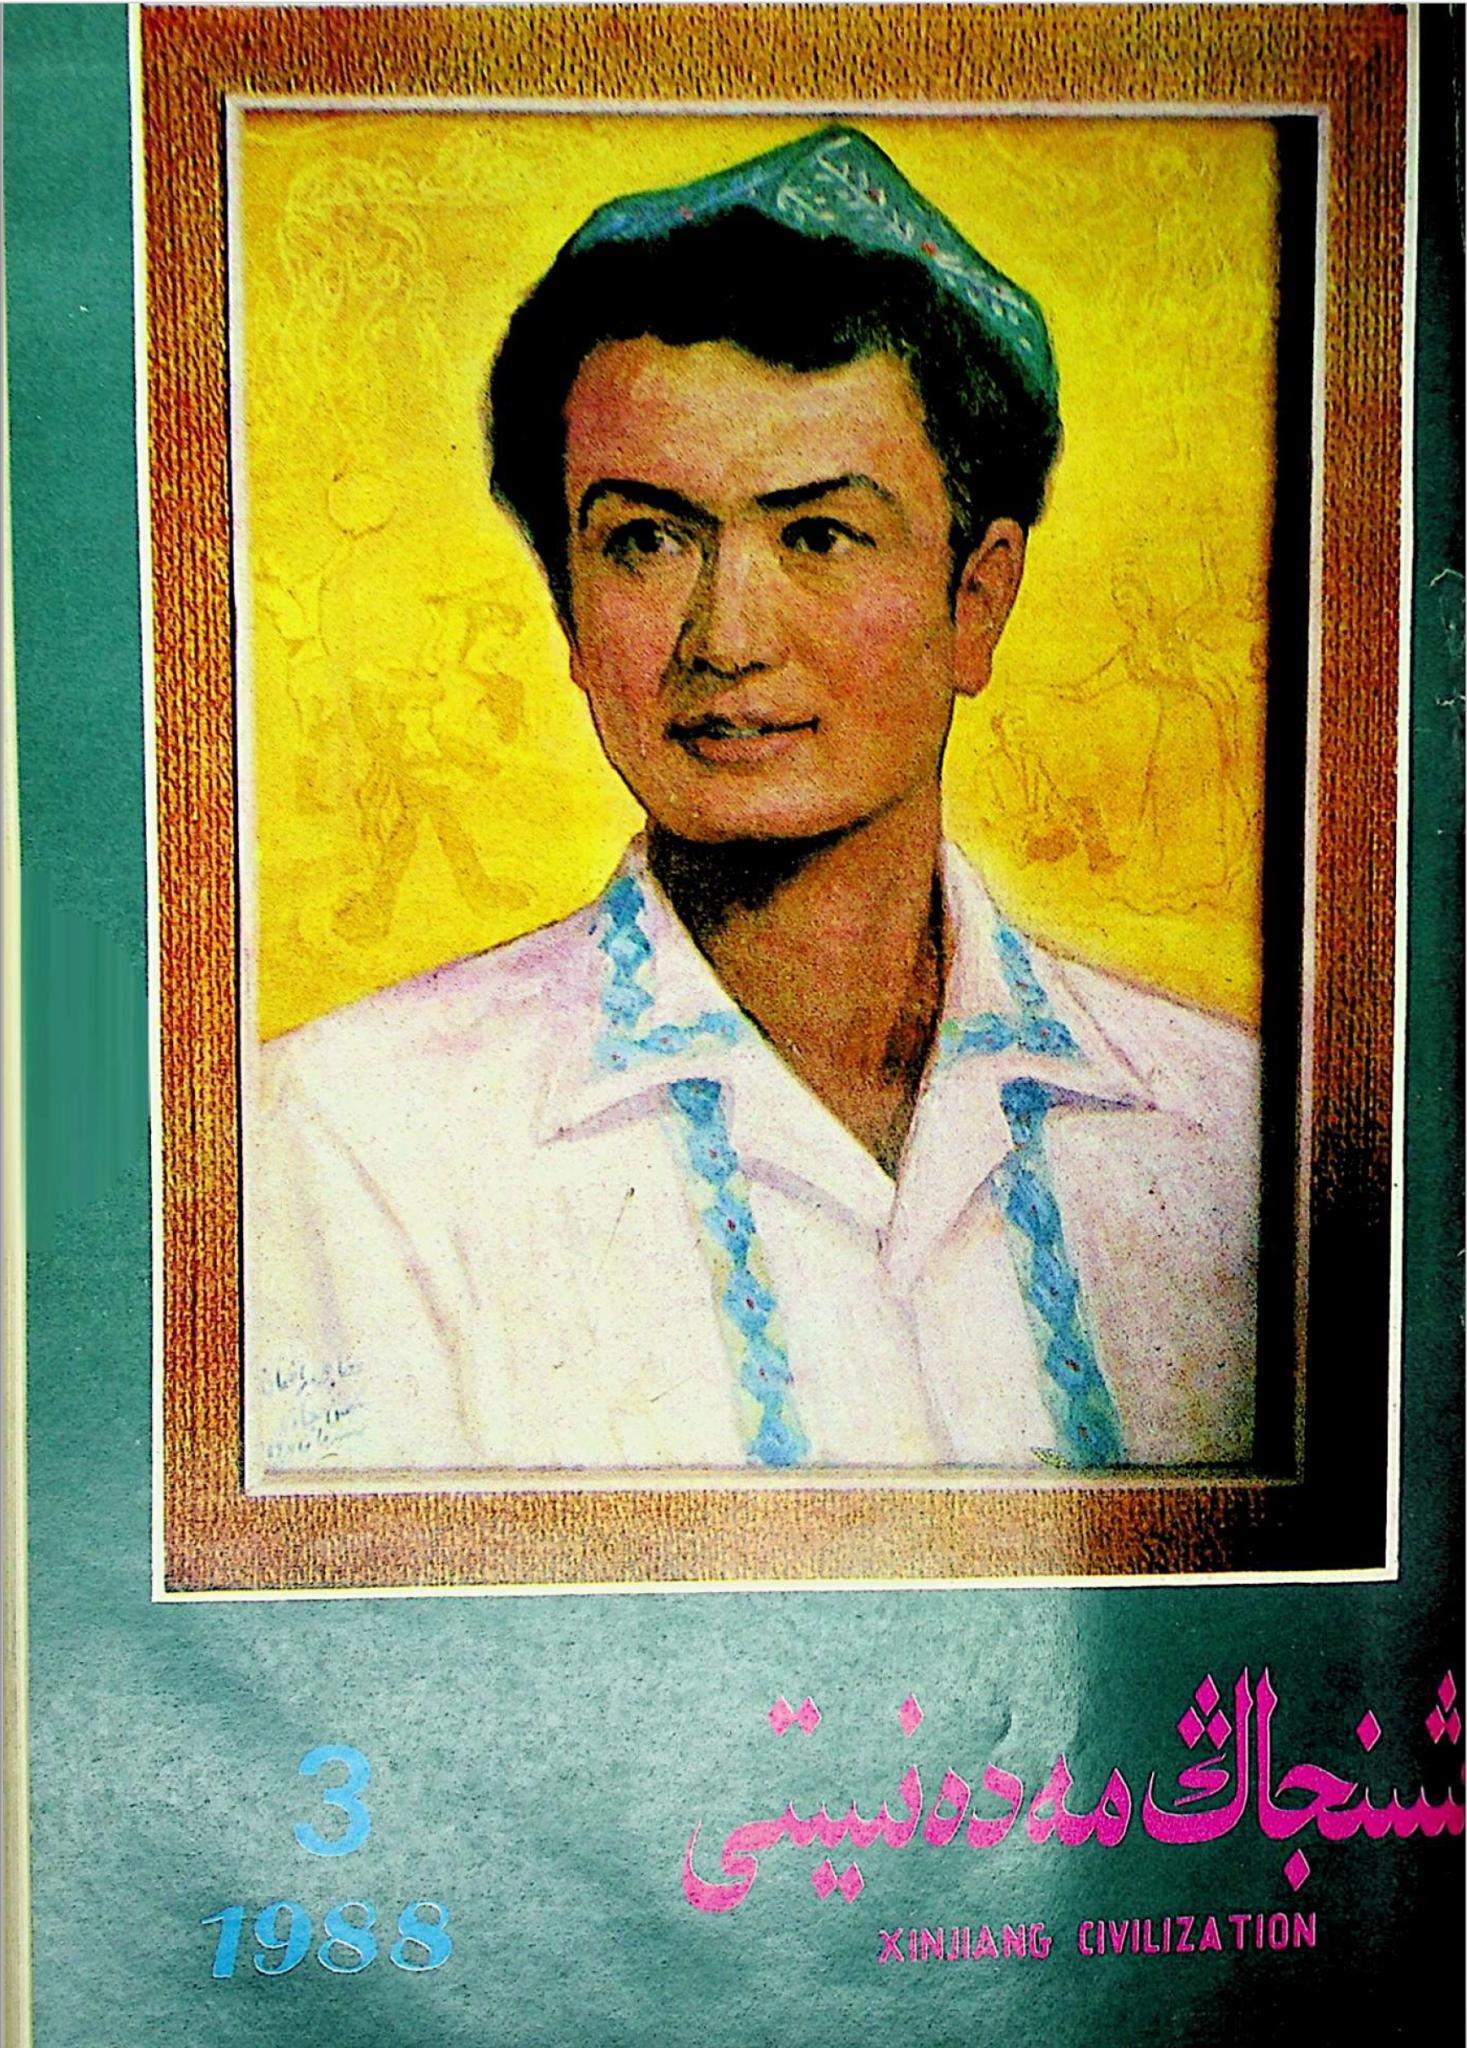 Screenshot 2020 03 08 at 15.31.08 - شىنجاڭ مەدەنىيىتى 1988-يىلى 3-سان